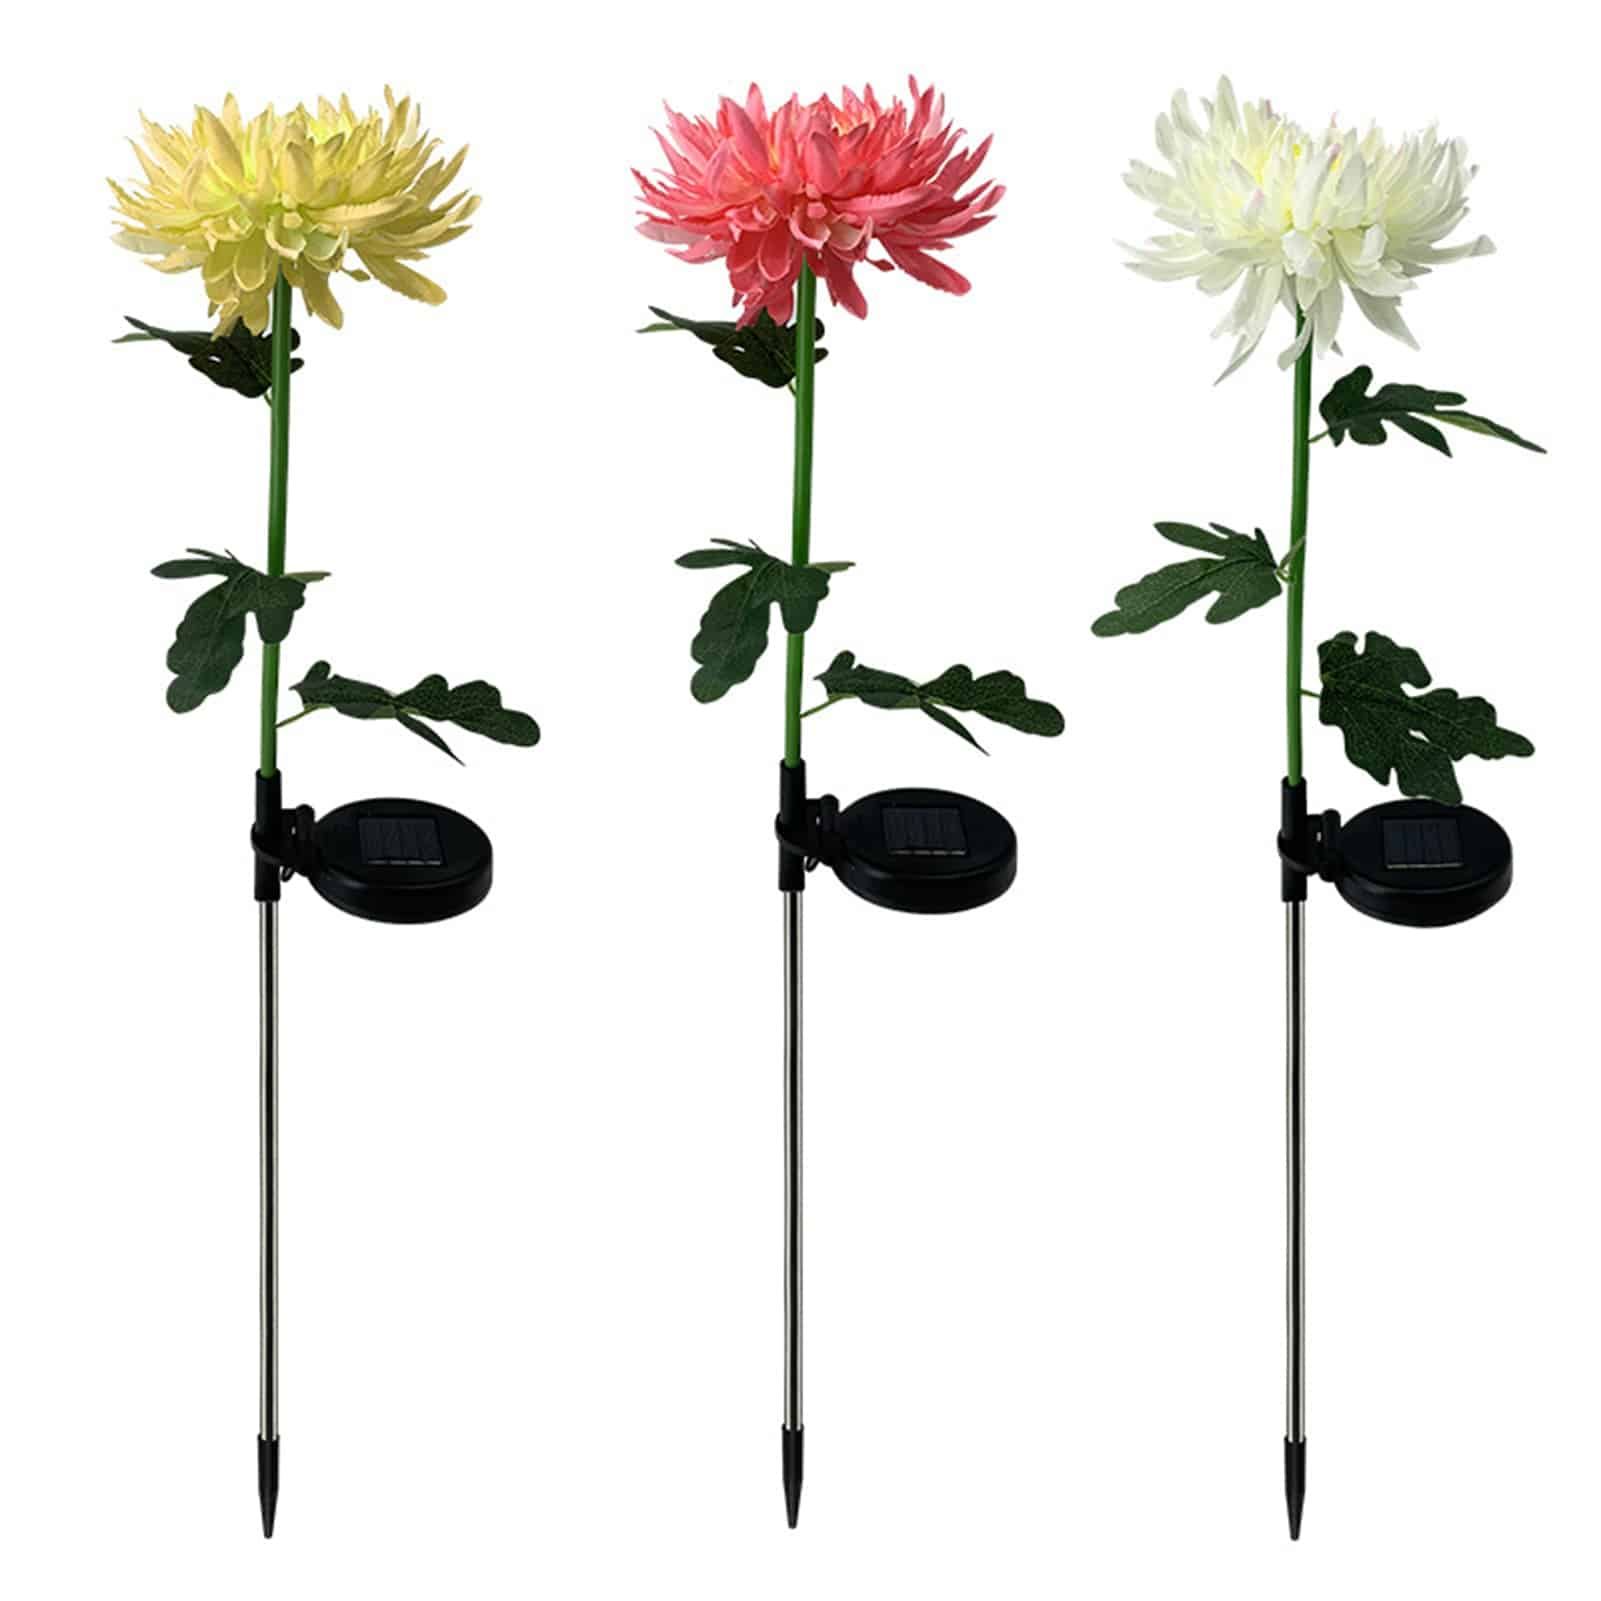 LED Solar Power Chrysanthemum